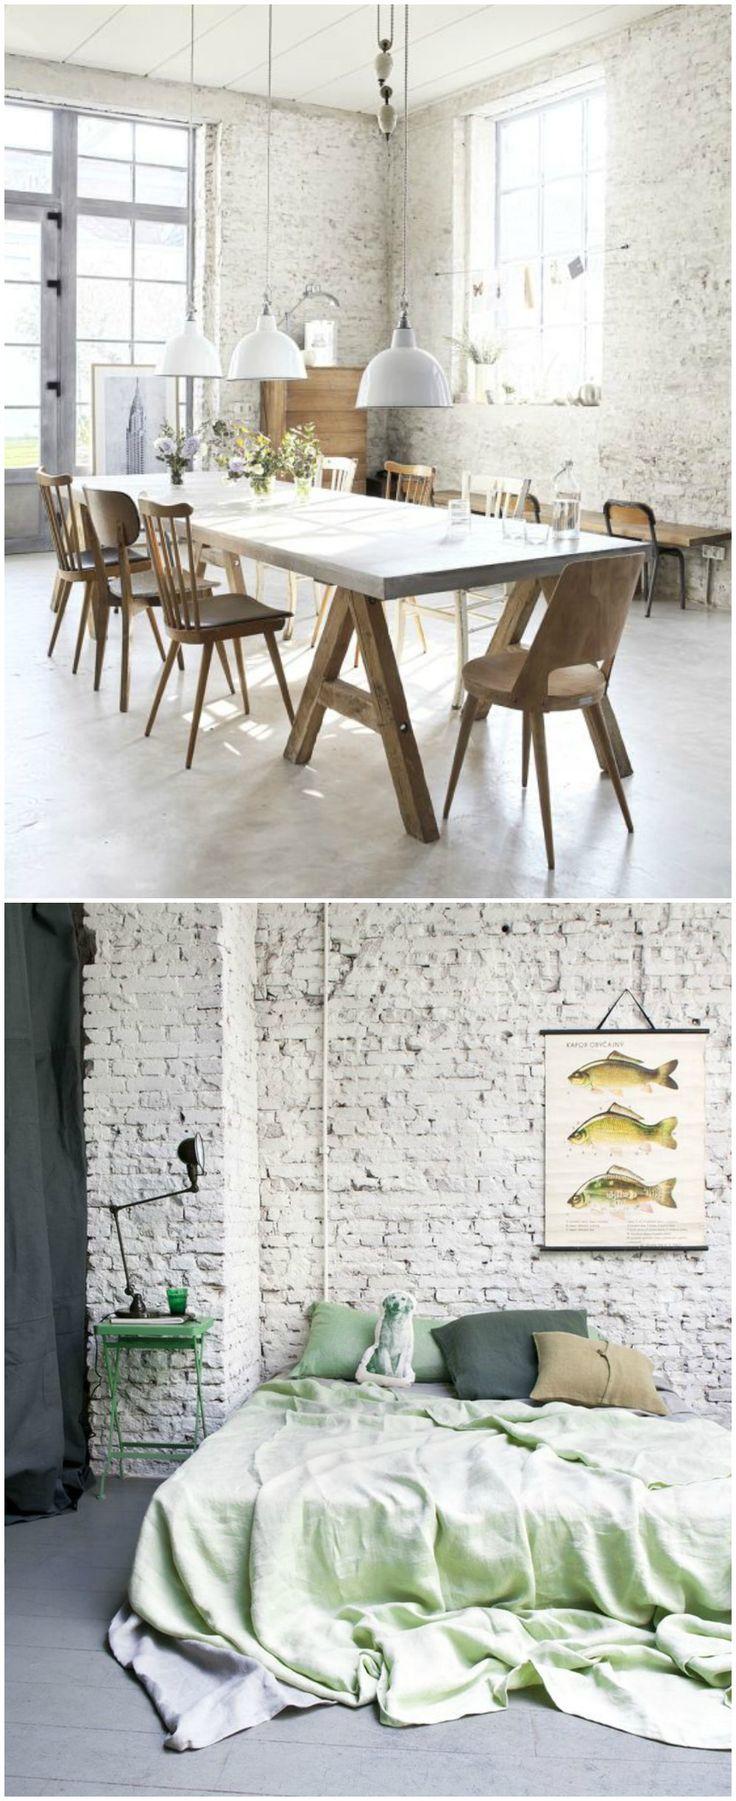 M s de 25 ideas fant sticas sobre paredes de ladrillo en - Pared ladrillo visto ...